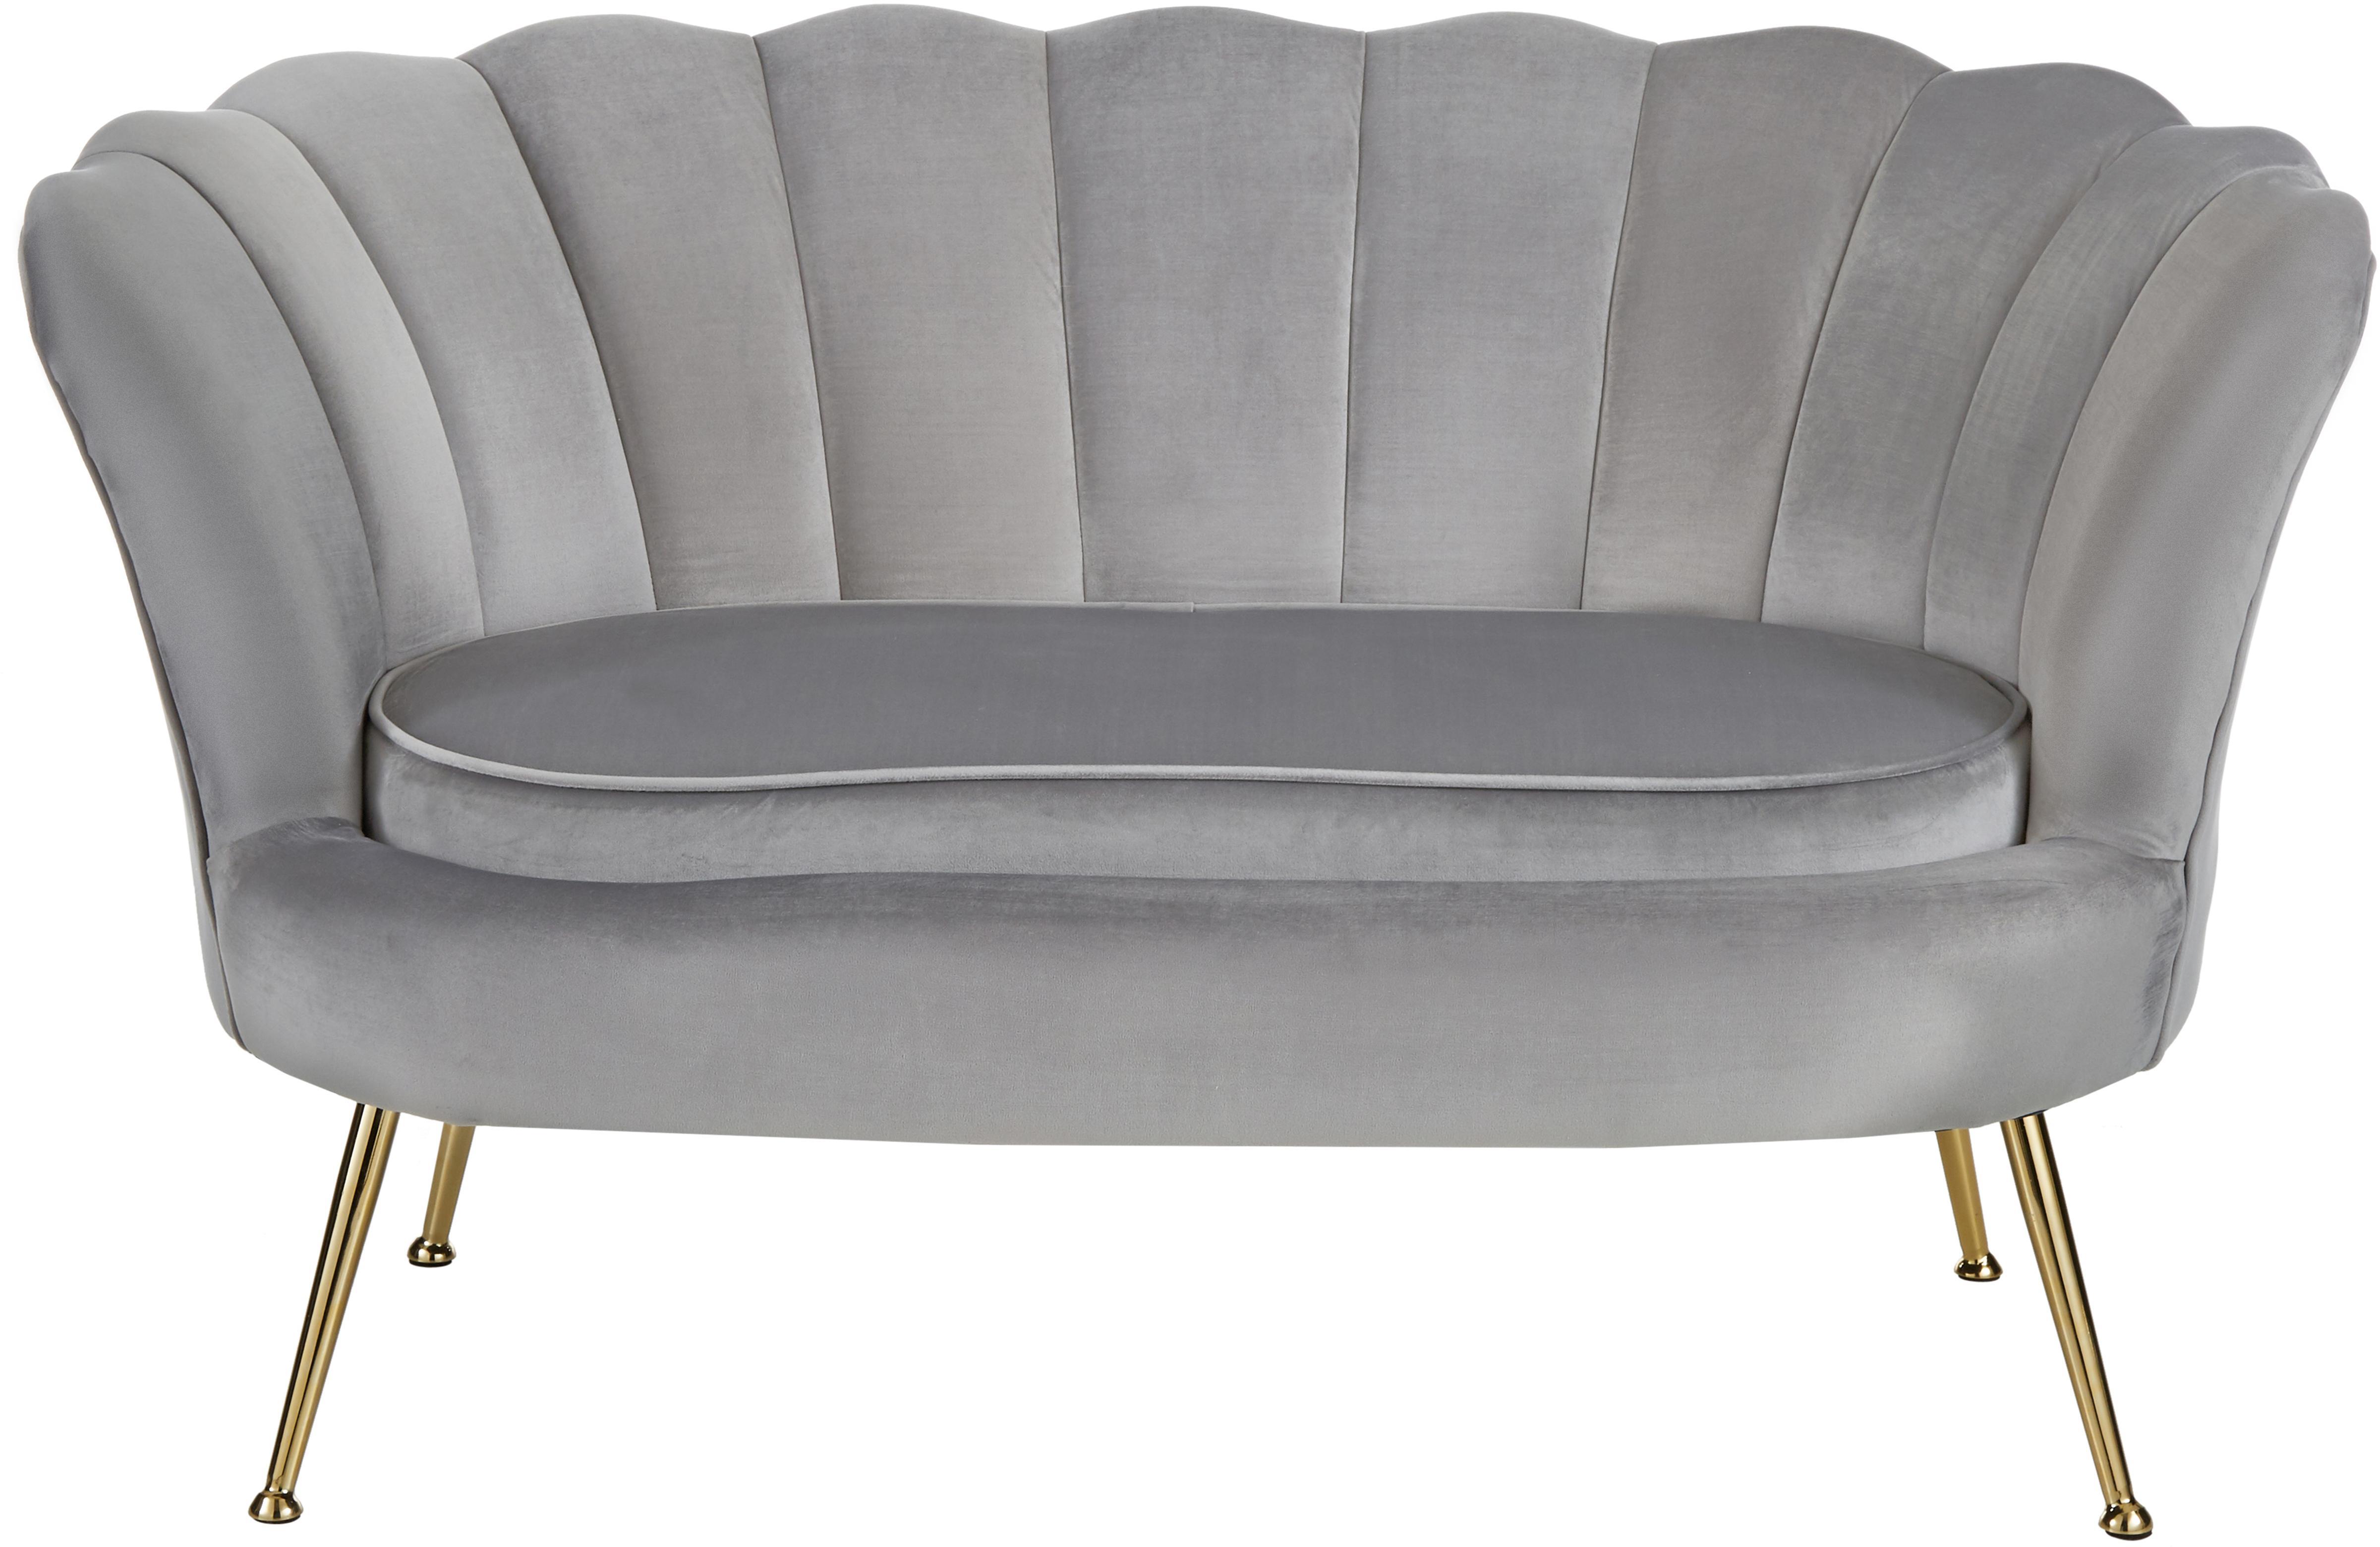 Samt-Sofa Oyster (2-Sitzer), Bezug: Samt (Polyester) 20.000 S, Gestell: Massives Pappelholz, Sper, Füße: Metall, galvanisiert, Samt Grau, B 131 x T 78 cm